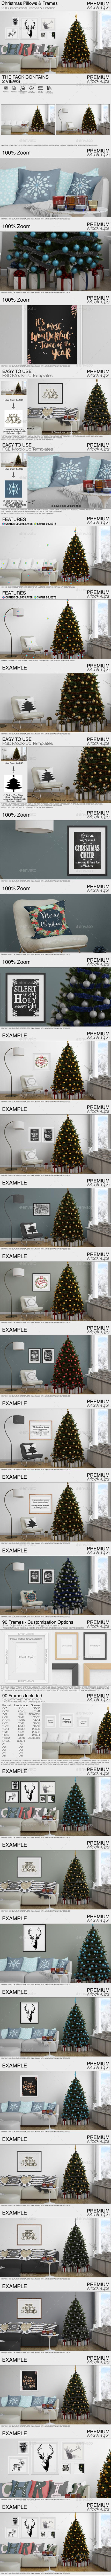 Christmas Pillows & Frames Pack - Print Product Mock-Ups